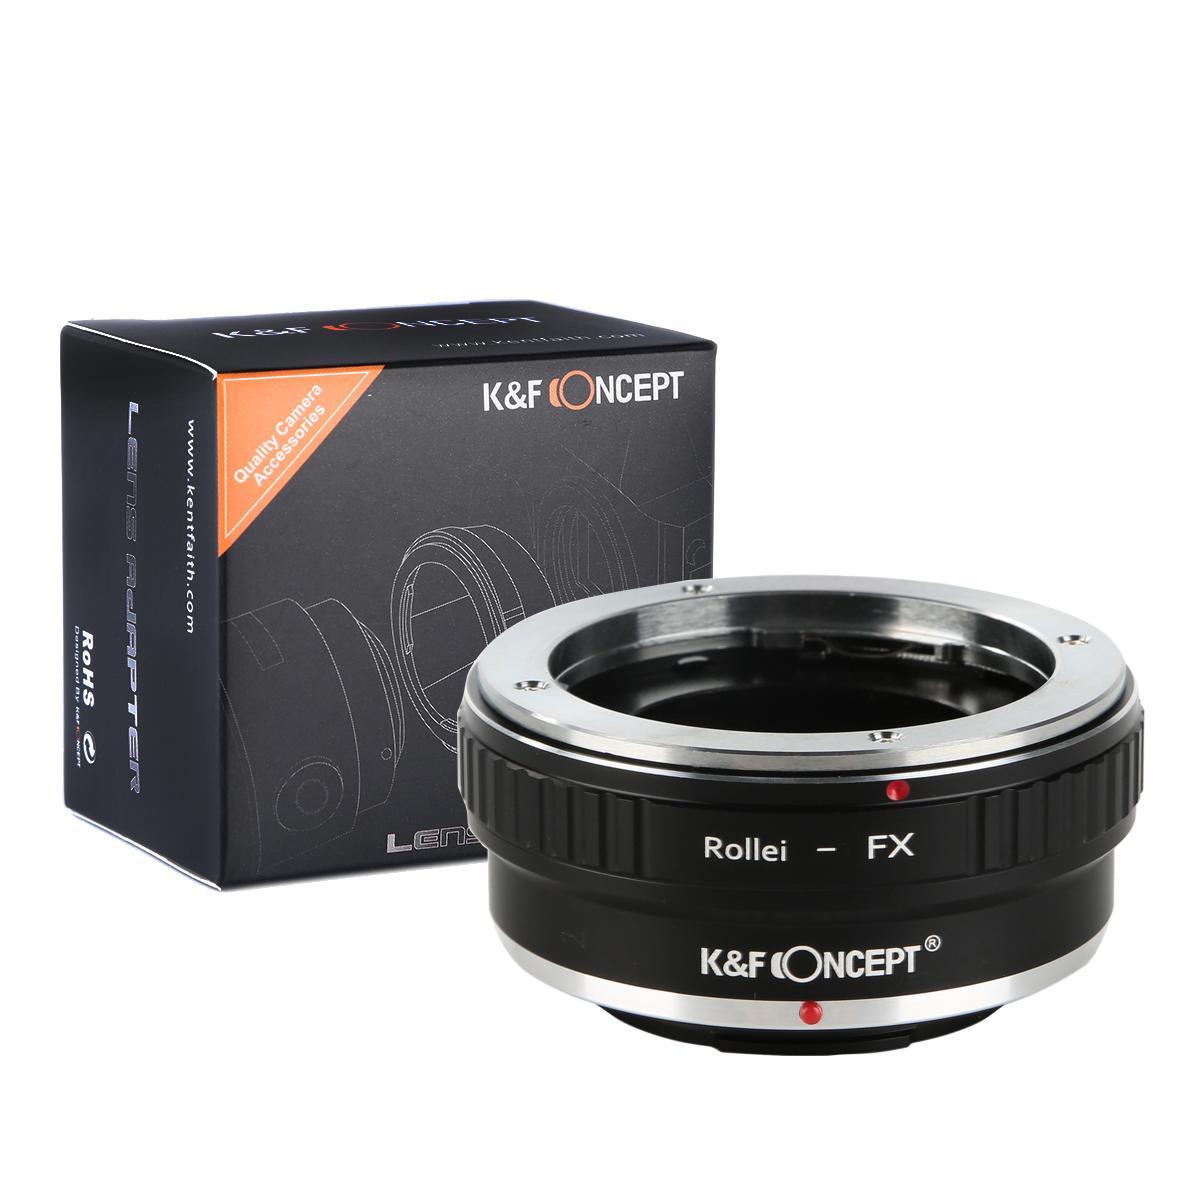 K&F M37111 Rollei QBM Lentes para Fuji X Lens Mount Adapter para DSLR